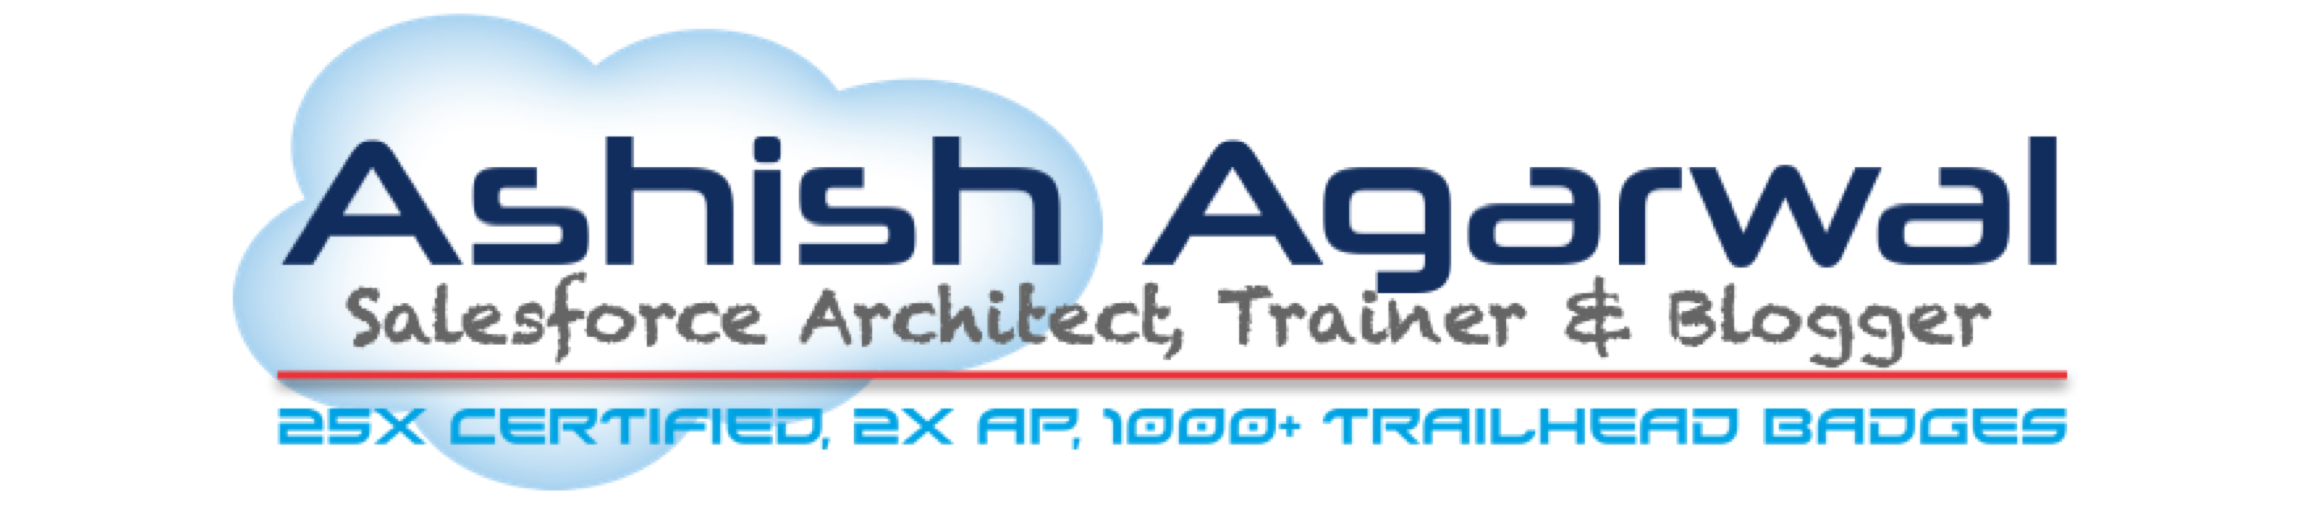 Ashish Agarwal - Independent Salesforce Architect, Trainer & Blogger